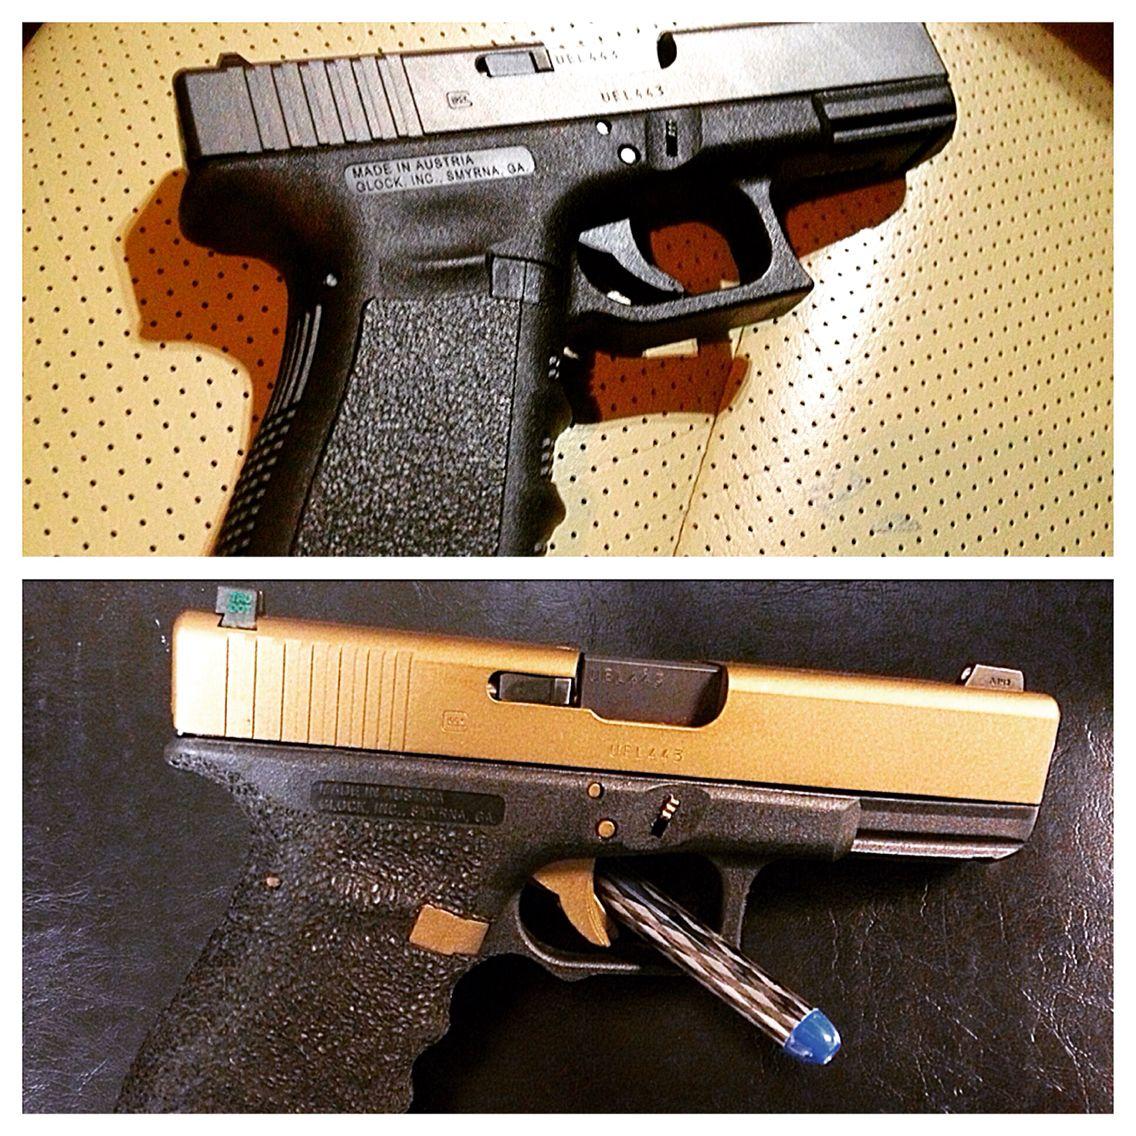 Glock 19 .9mm